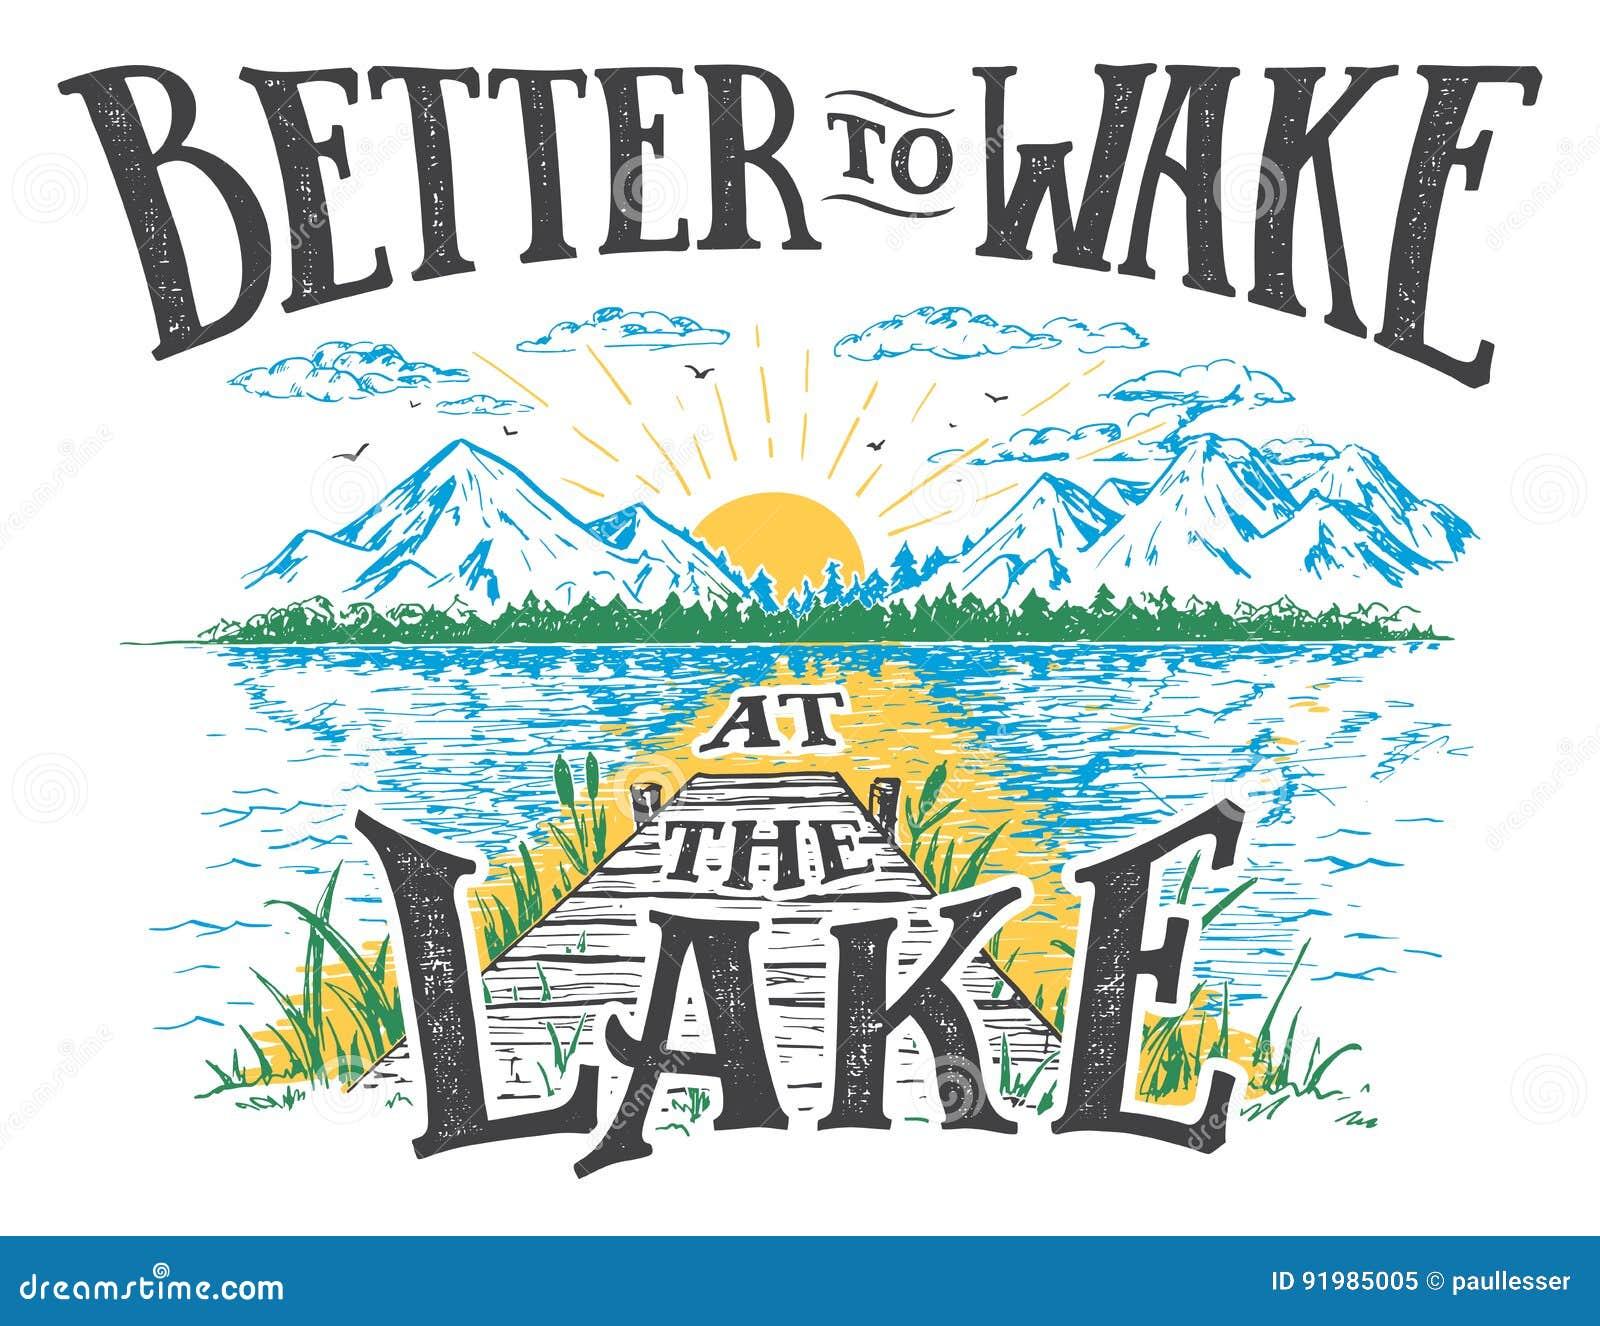 Better To Wake At The Lake Illustration